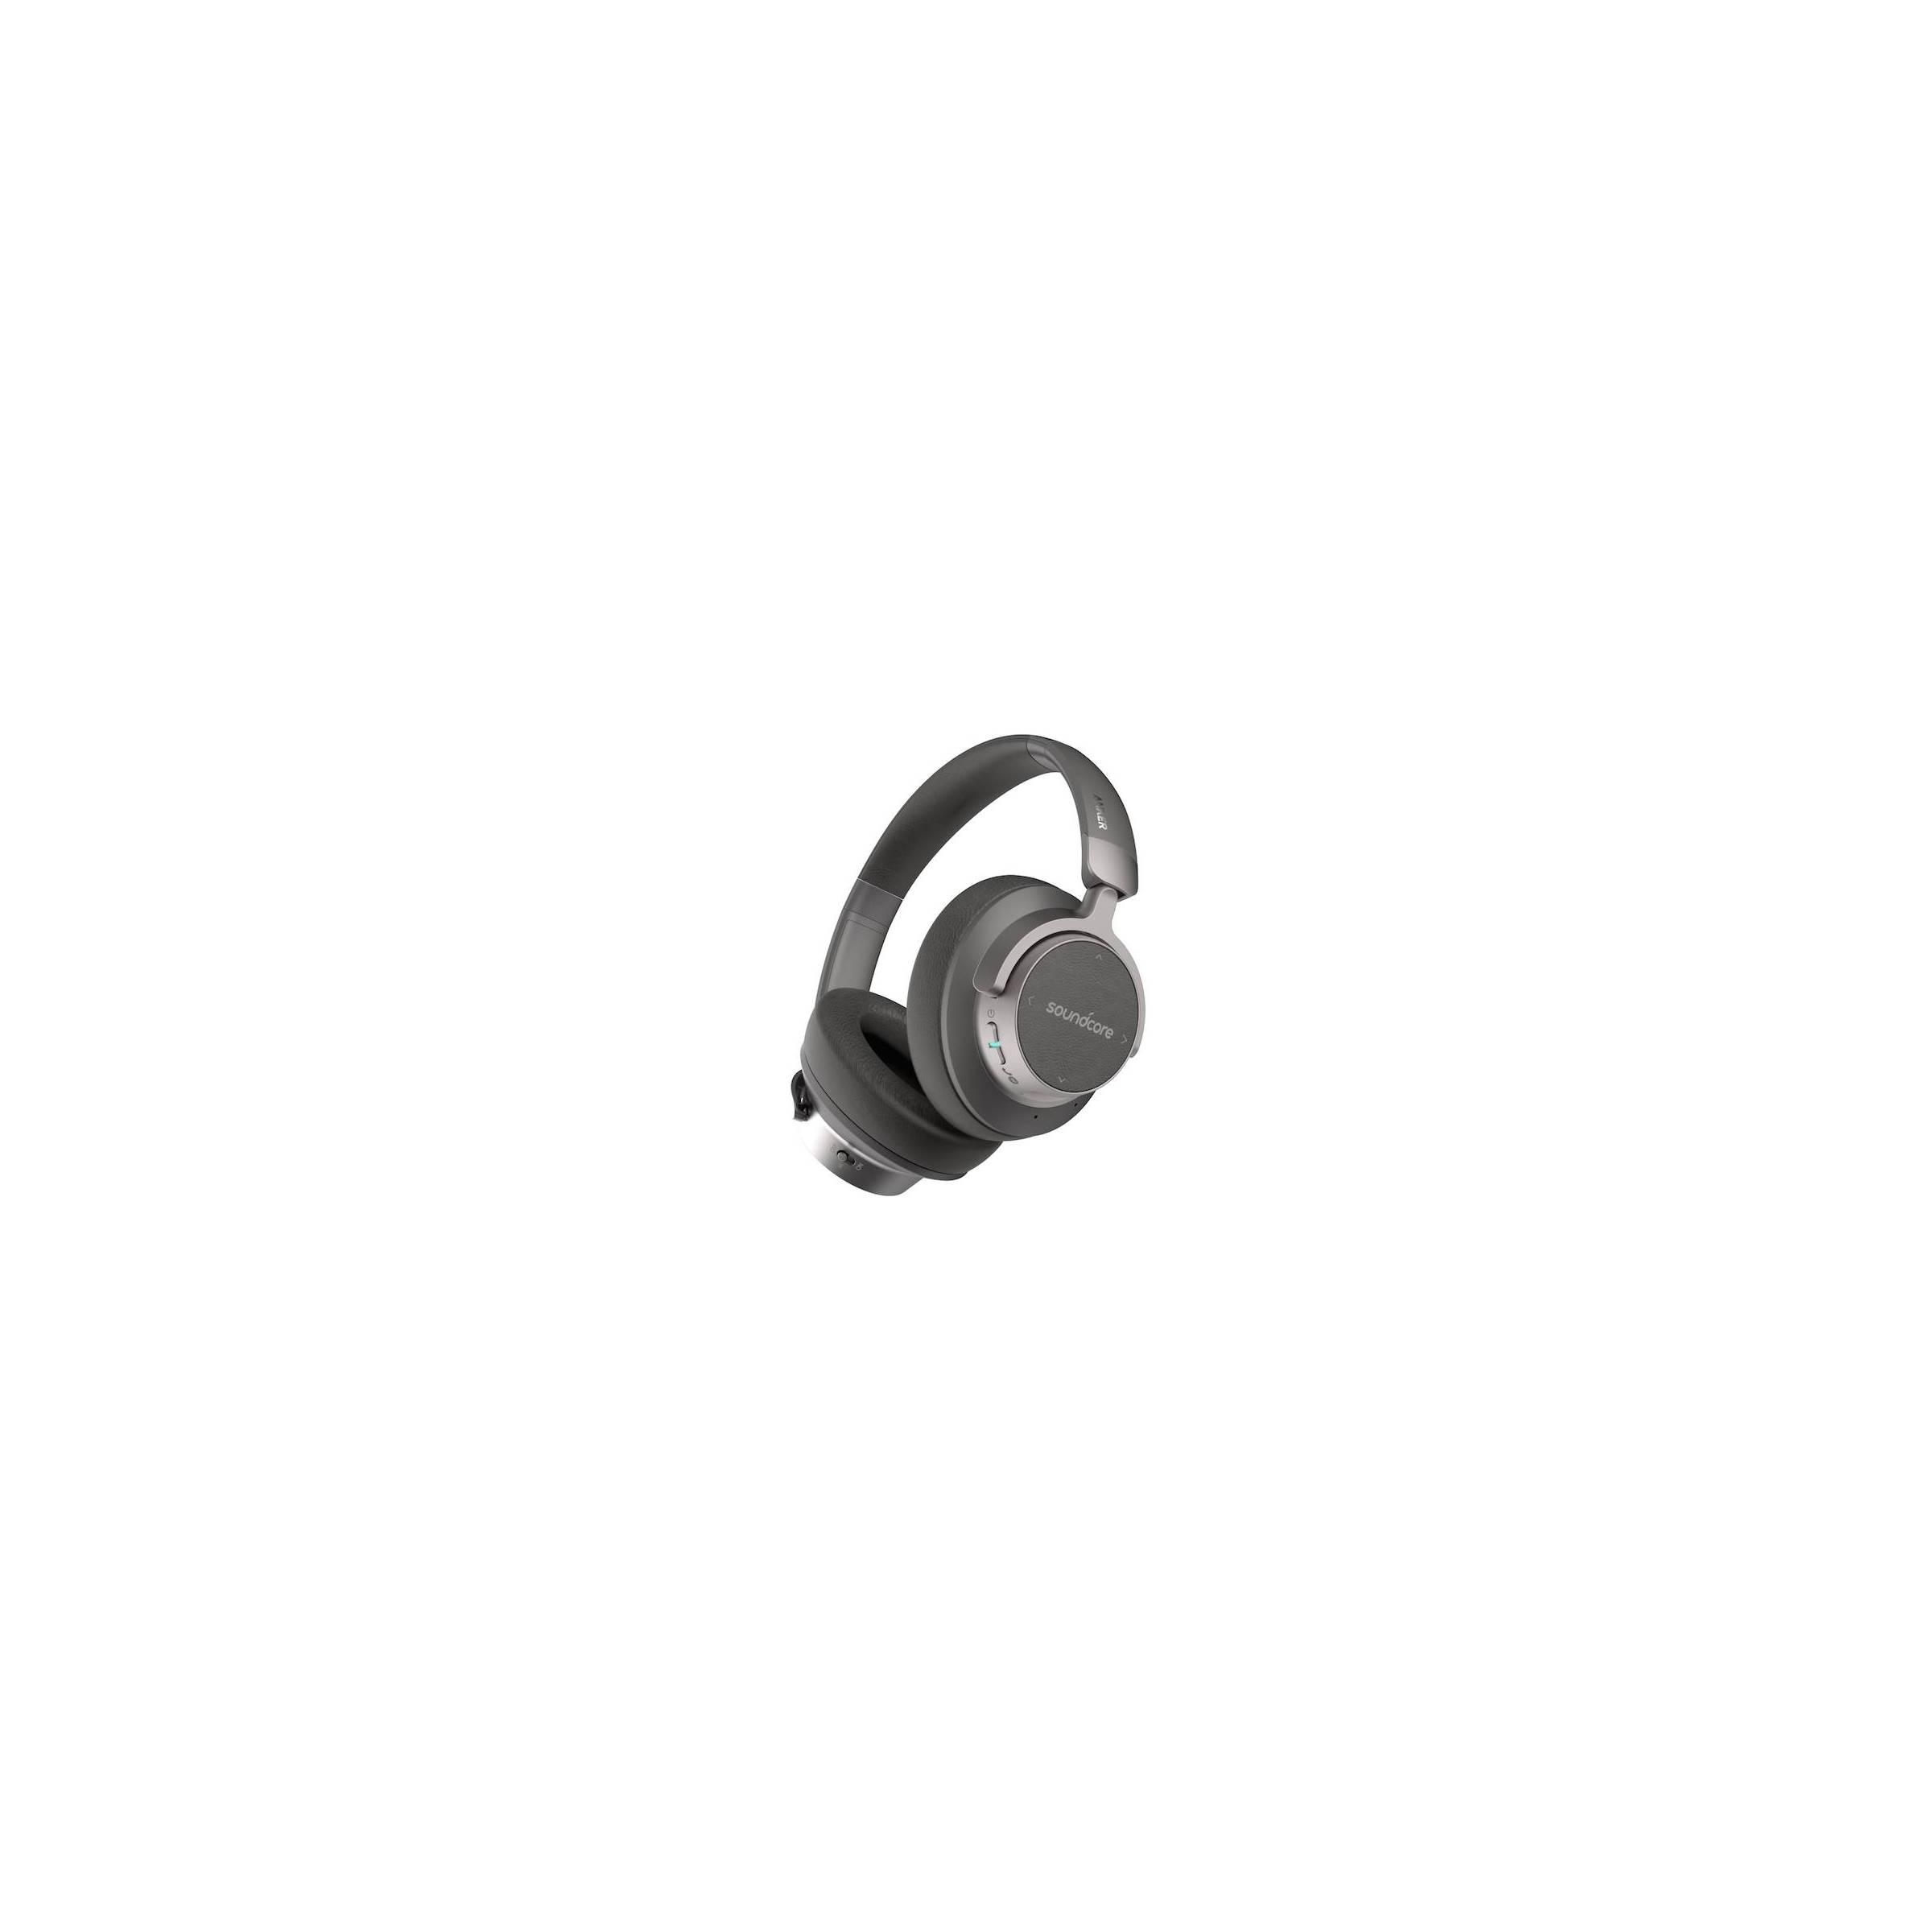 anker Anker soundcore space nc headphones bluetooth noise-reduction fra mackabler.dk